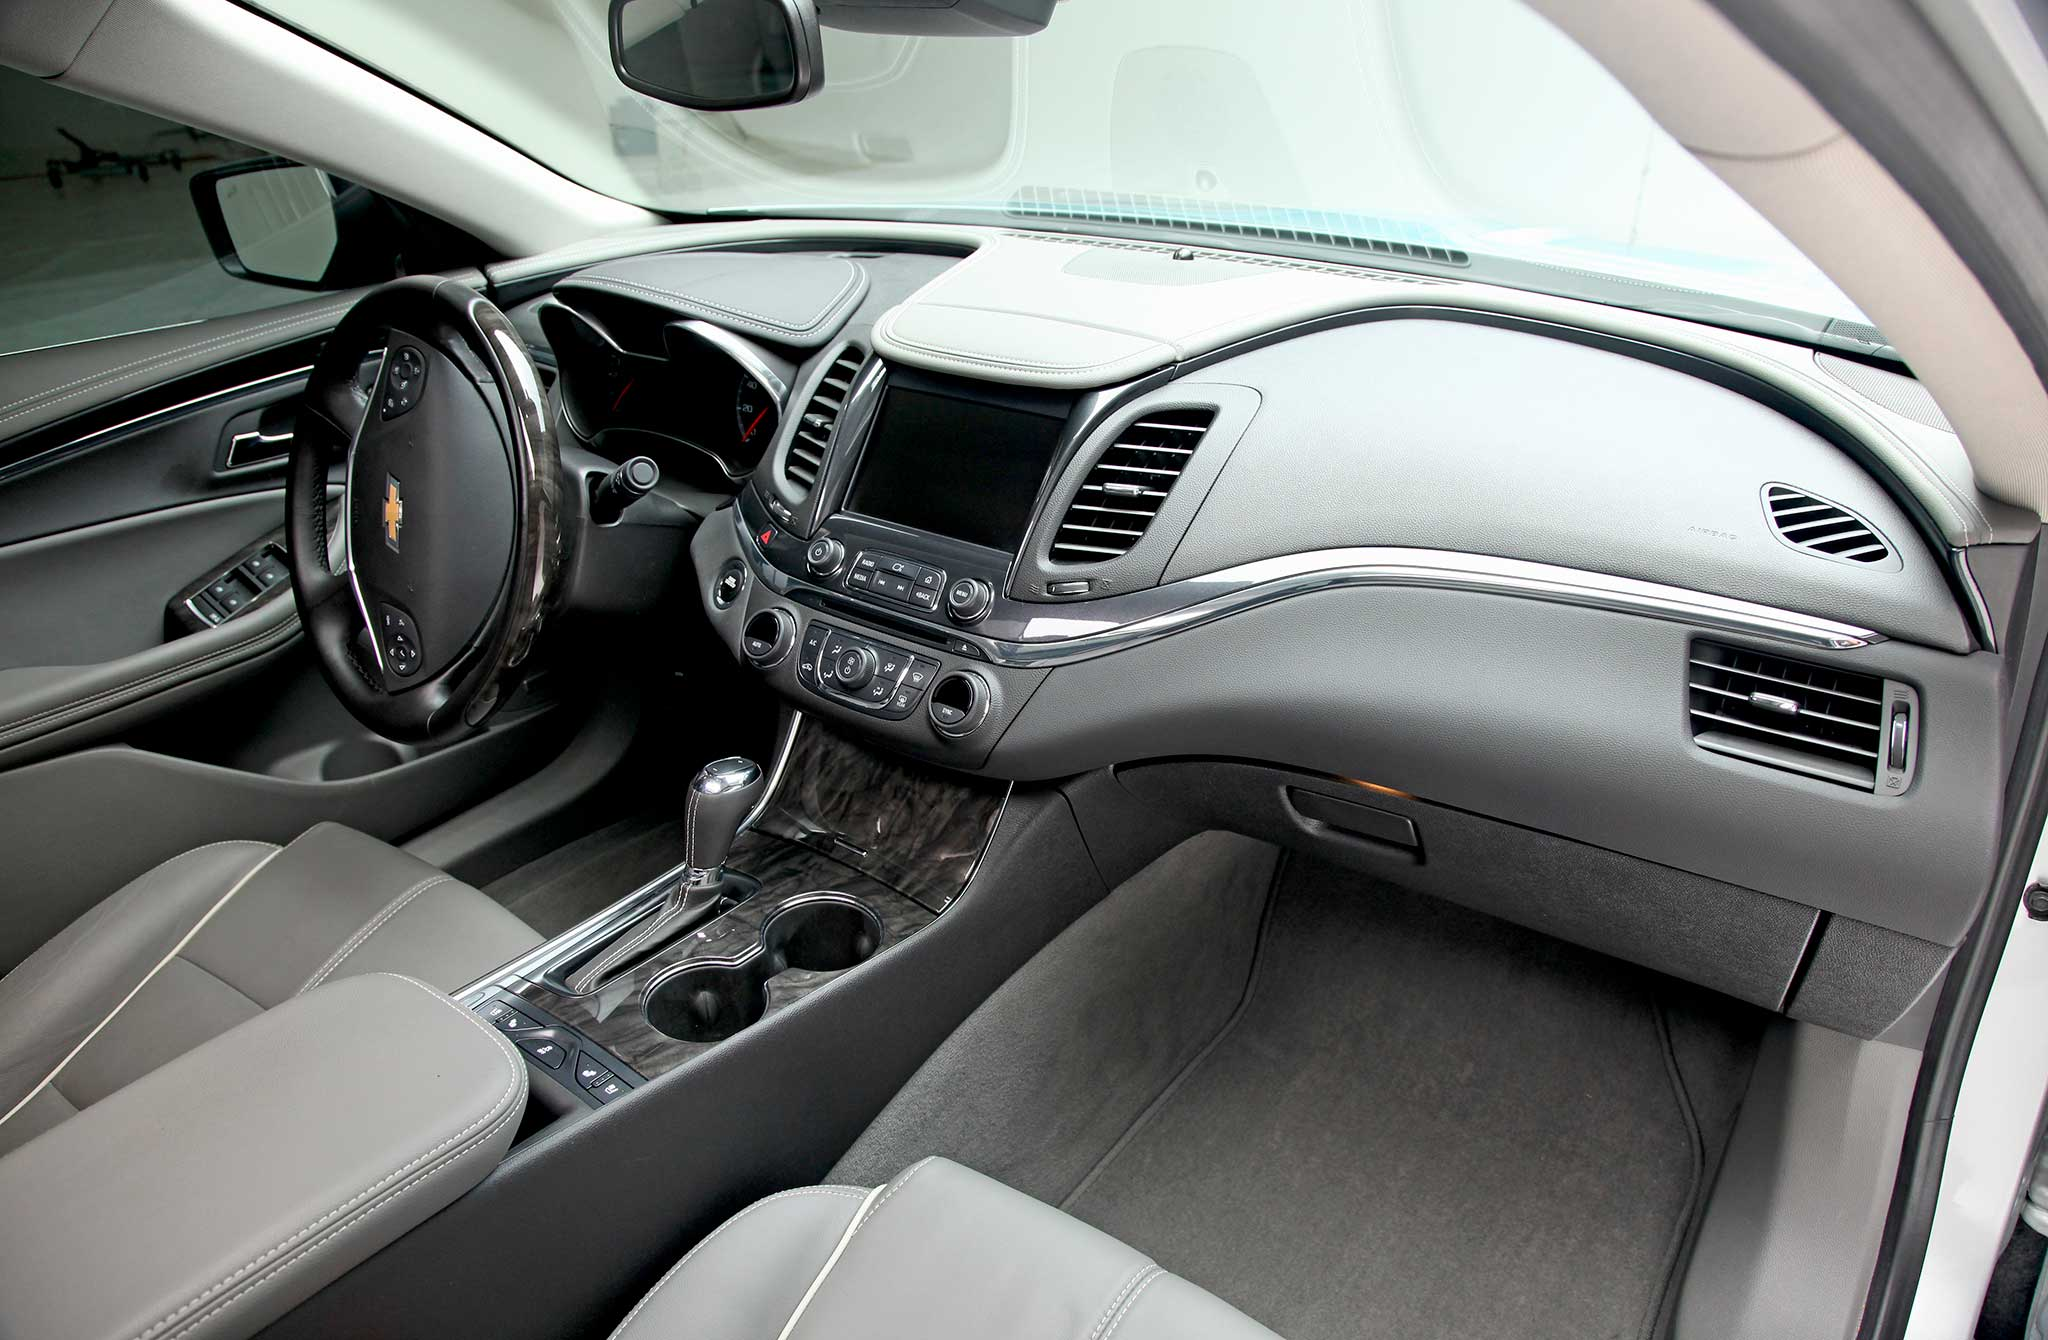 2014 Chevrolet Impala Generation X Lowrider